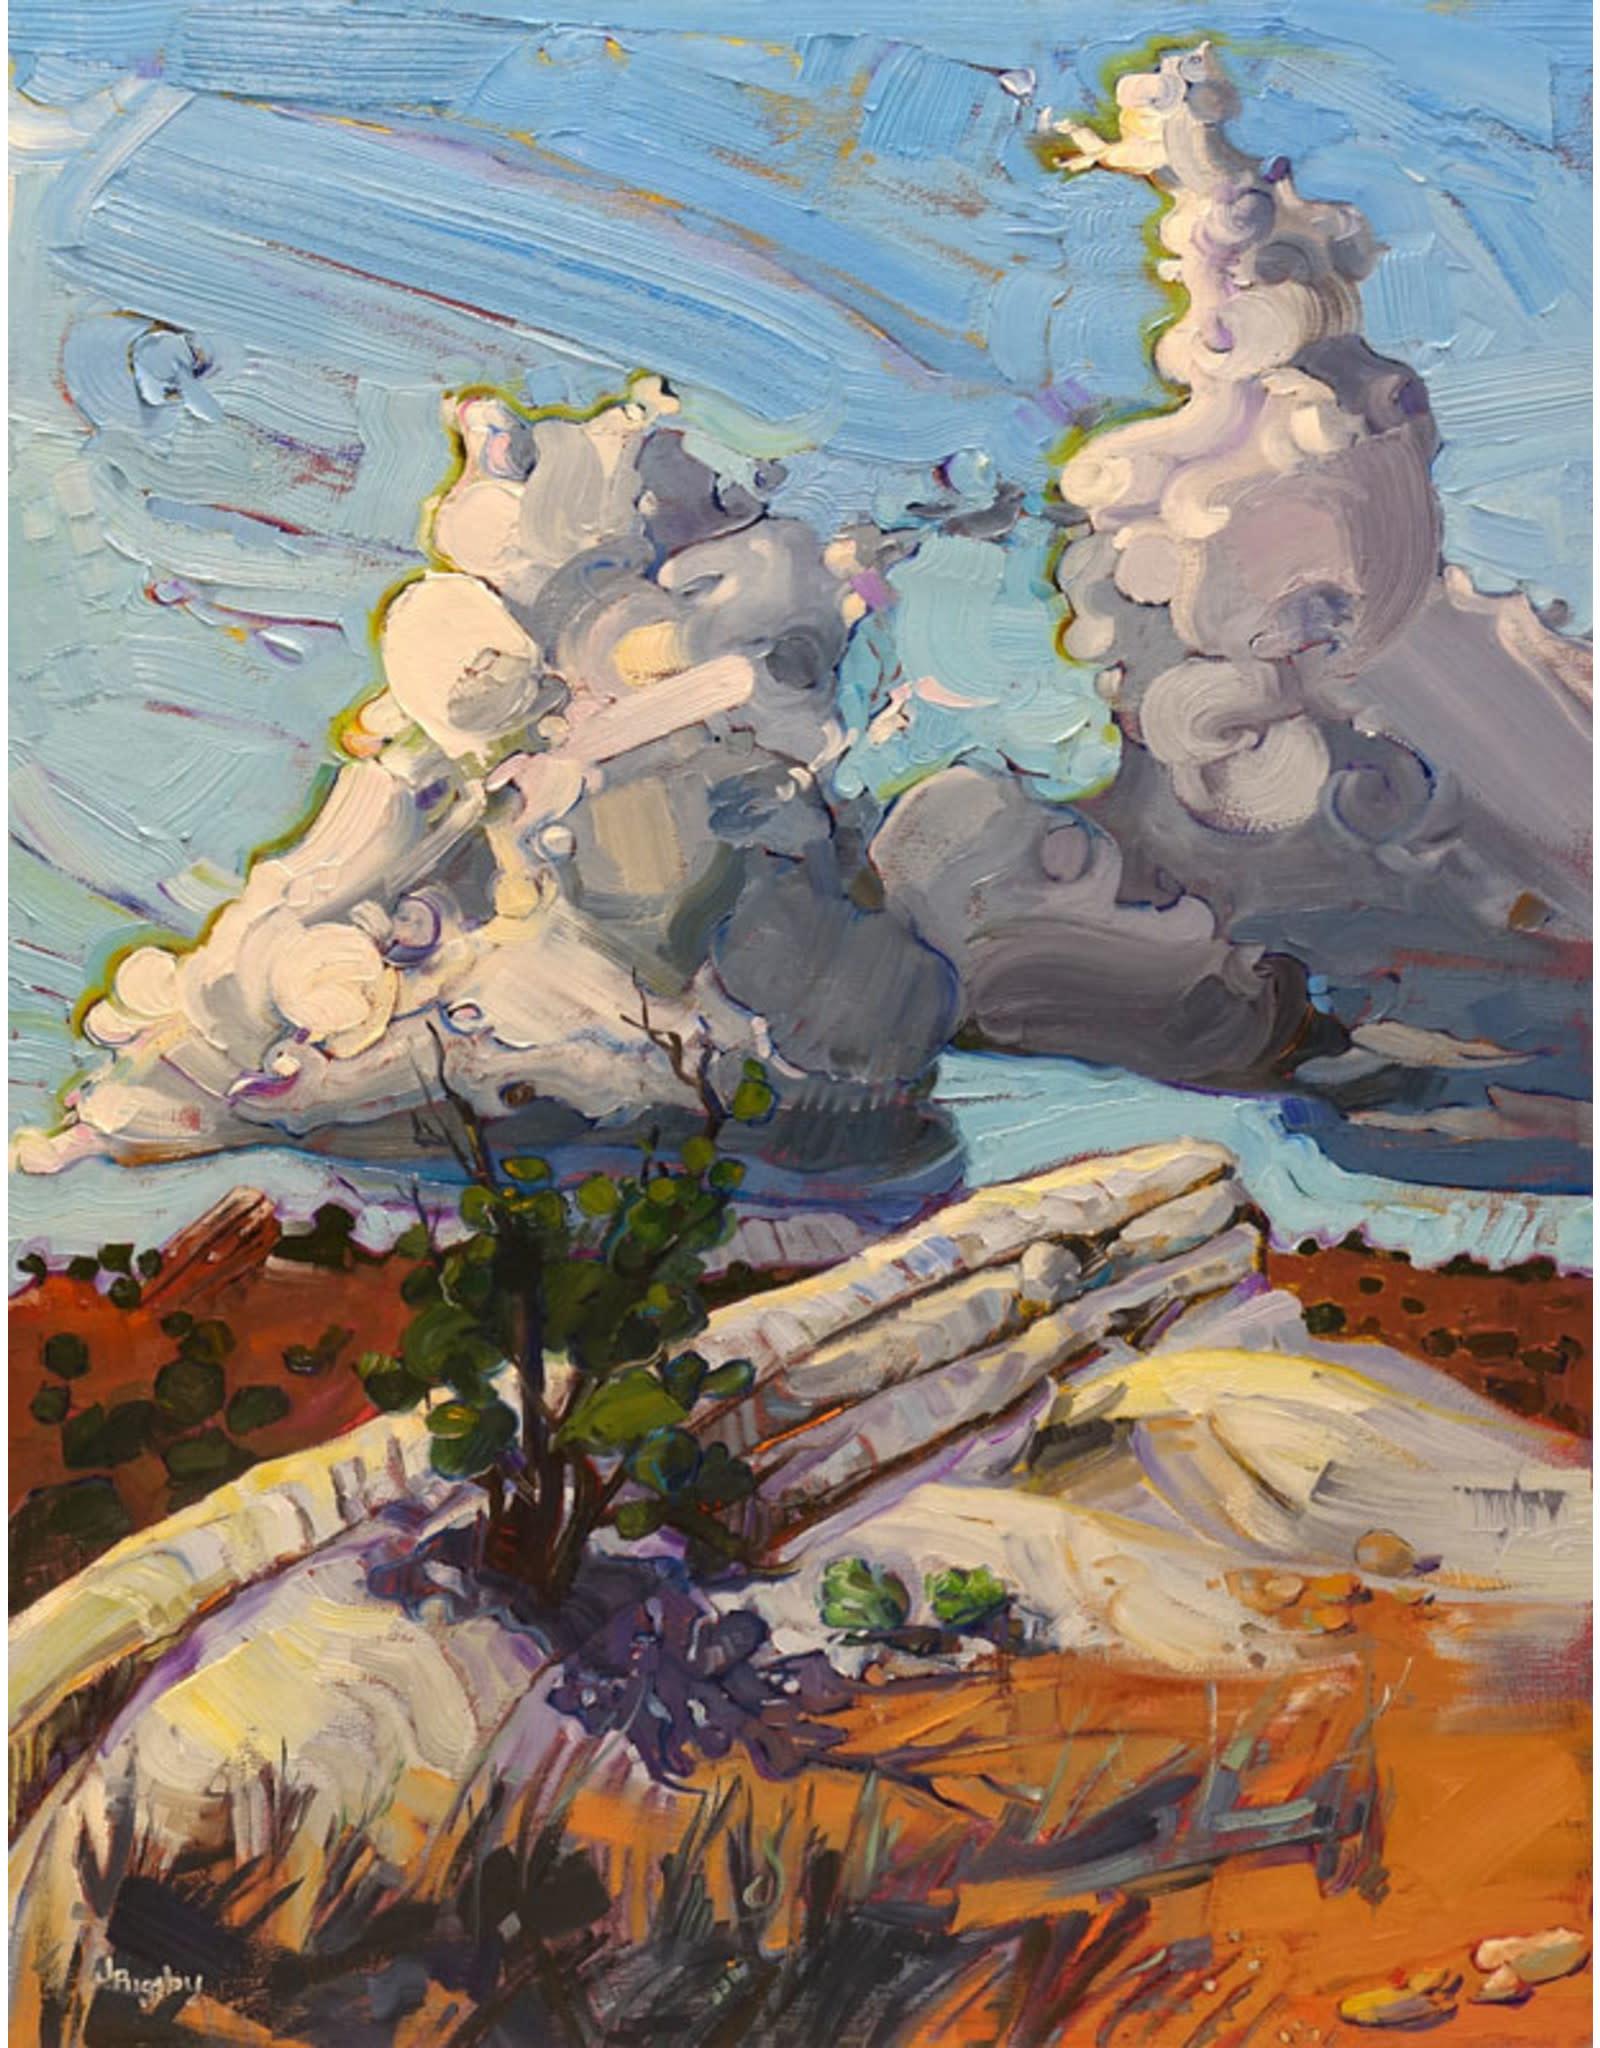 Jody Rigsby Nambe' Cloudscape - Jody Rigsby